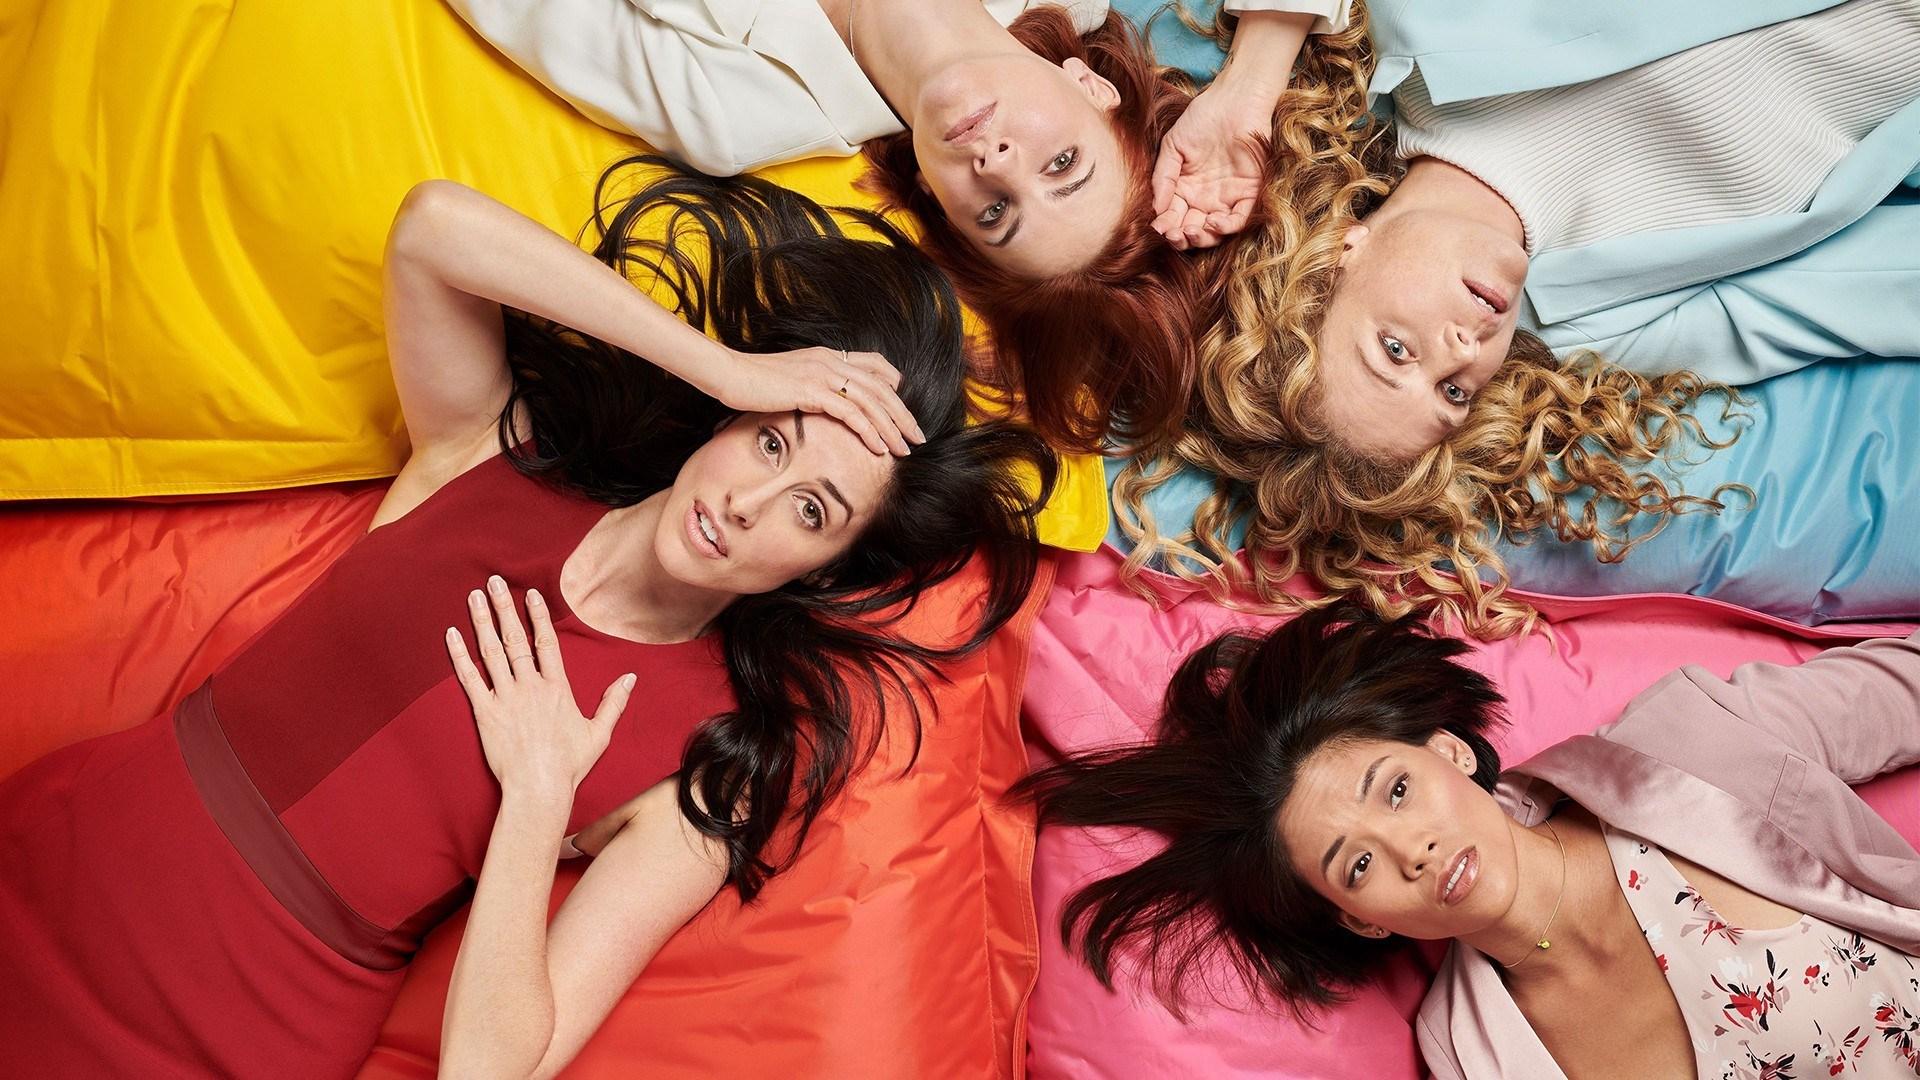 Seefoodplay | MY TOP NETFLIX BINGE WORTHY TV SHOW RECOMMENDATIONS | 2020 UK